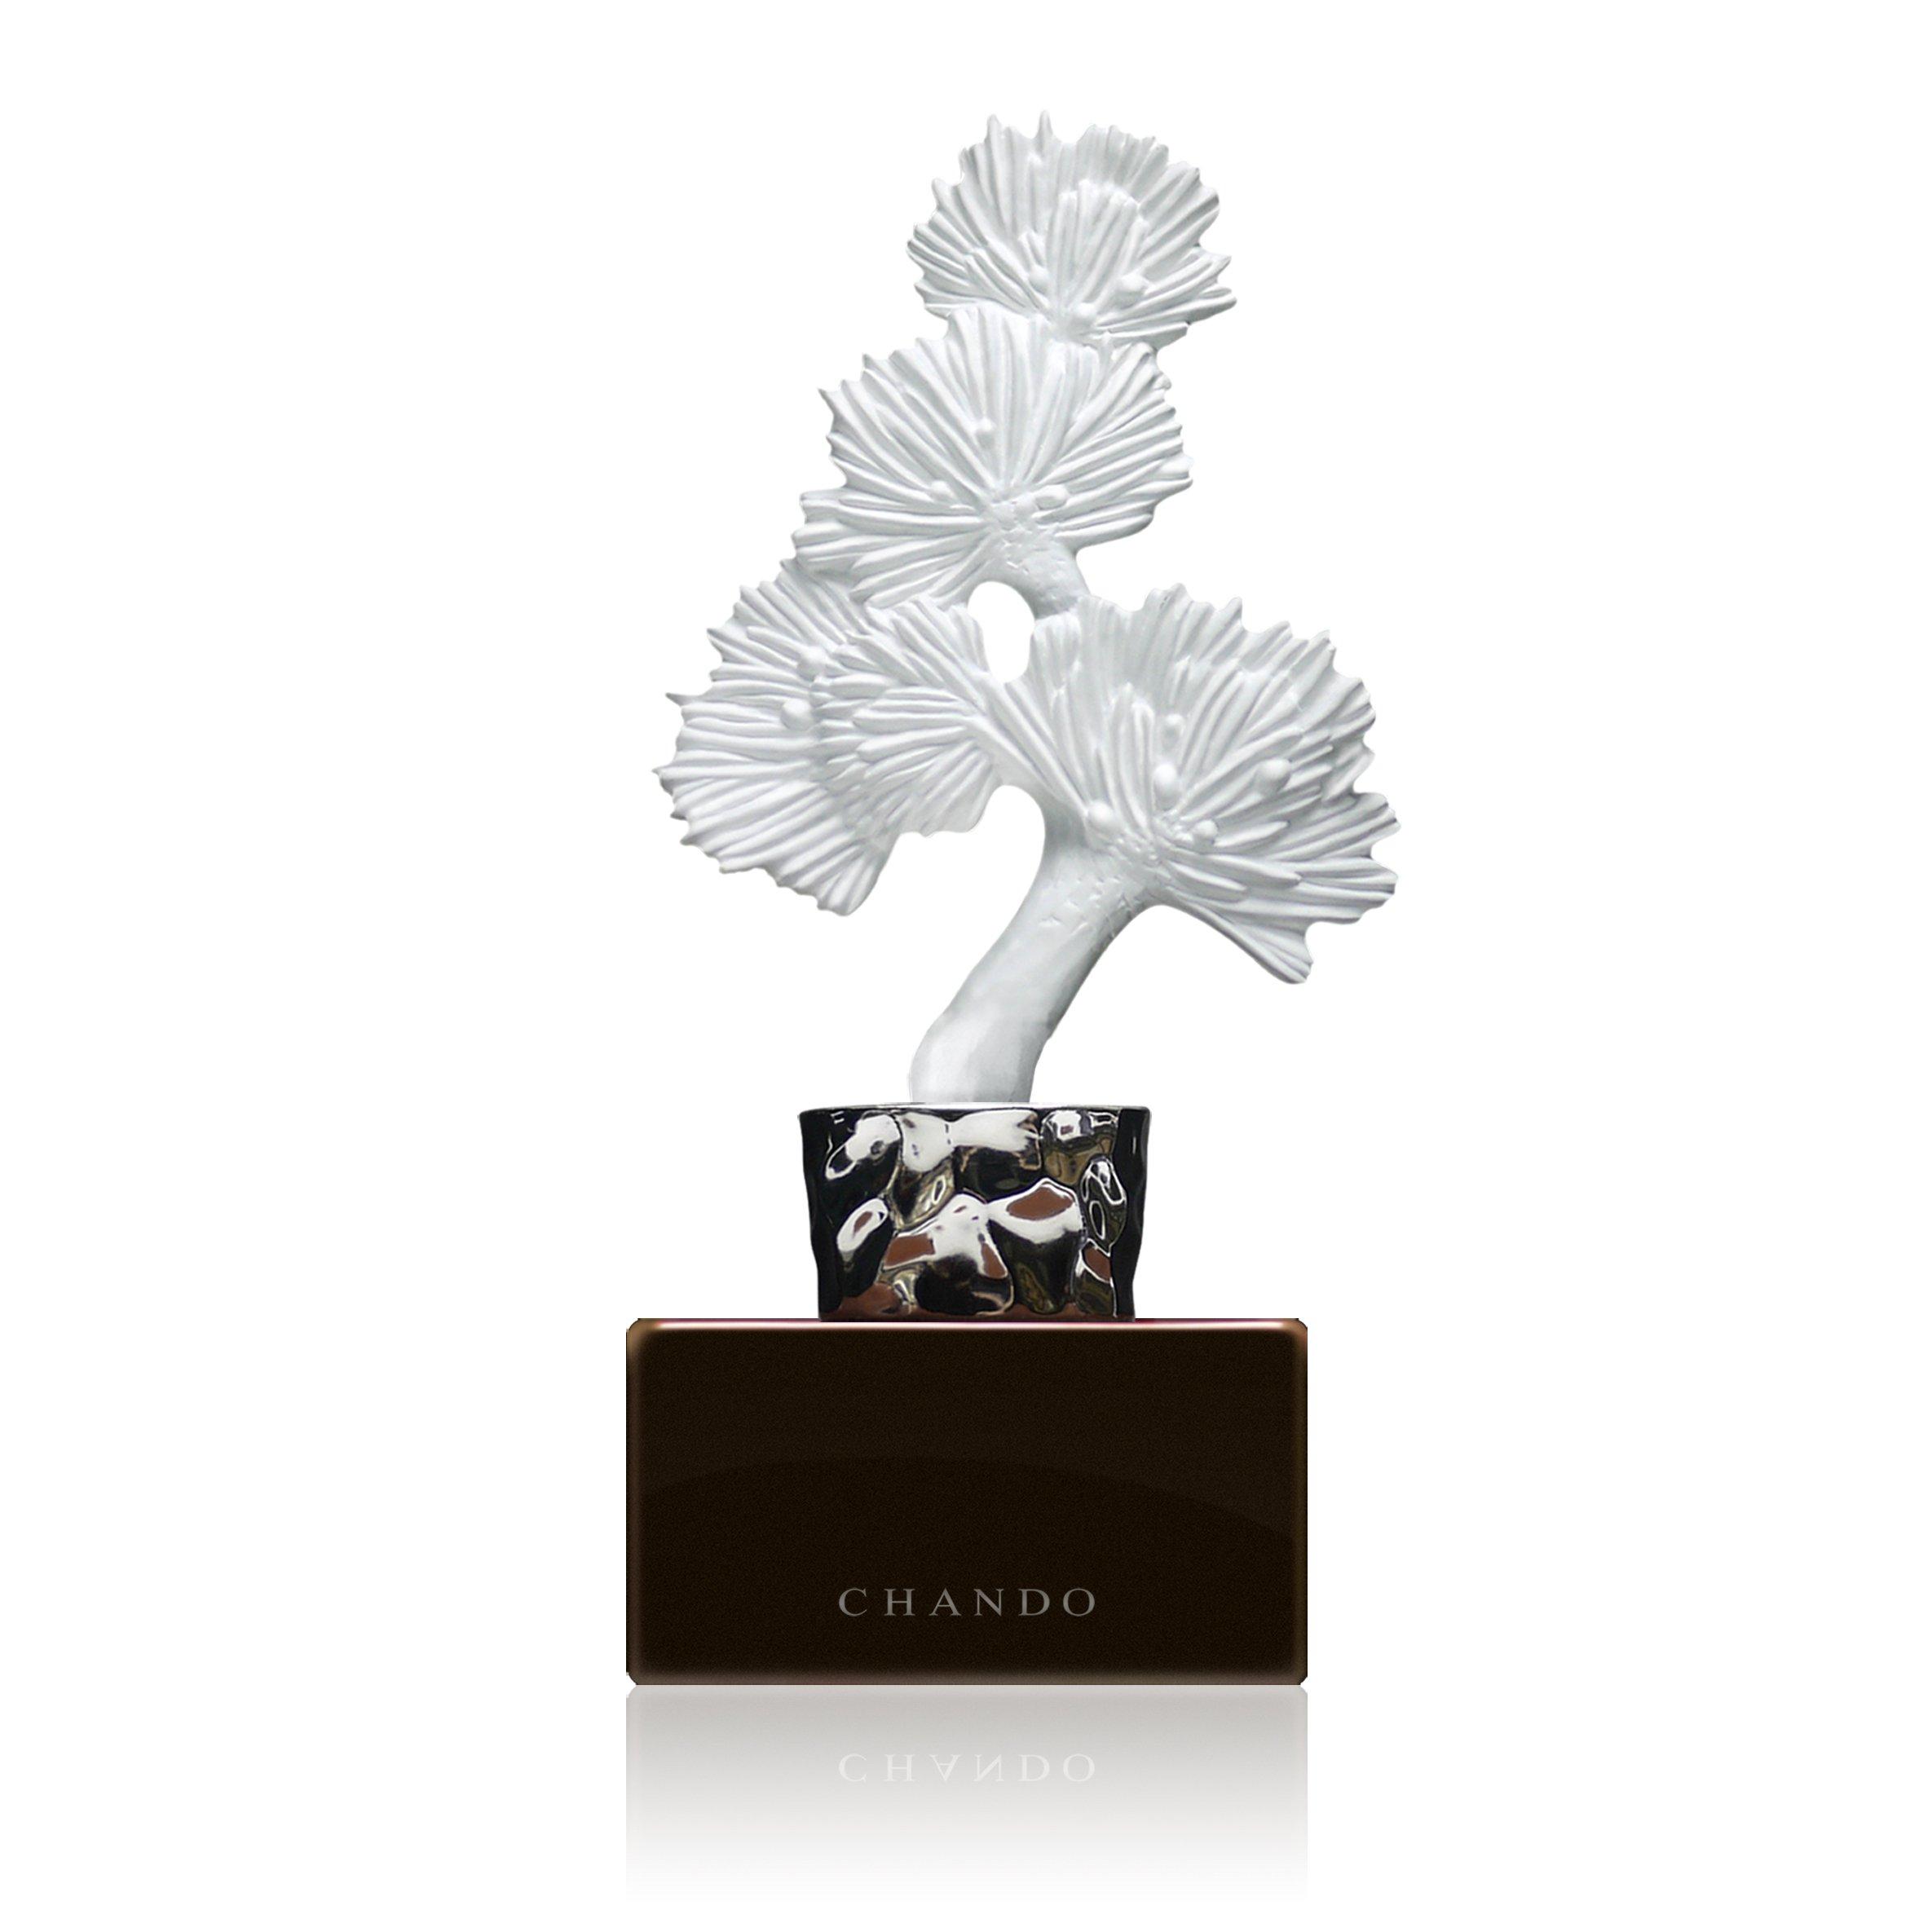 Chando Urban Collection Aroma Porcelain Diffuser Sandalwood Musk 100ml